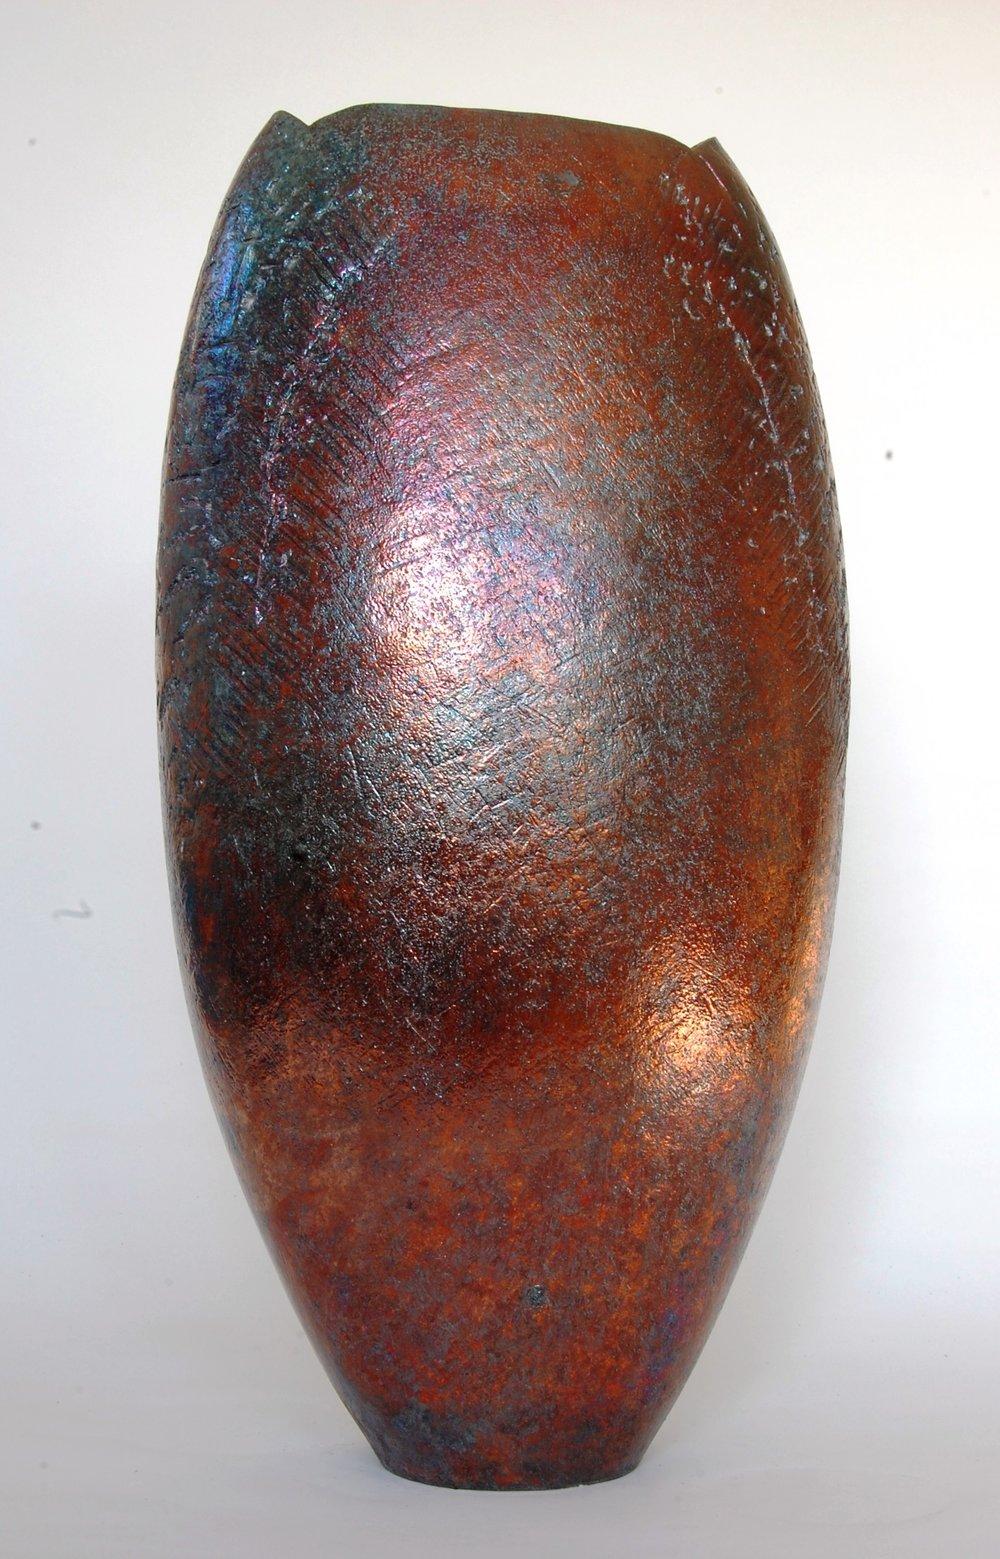 Tall Lustred Vessel - £1100.00